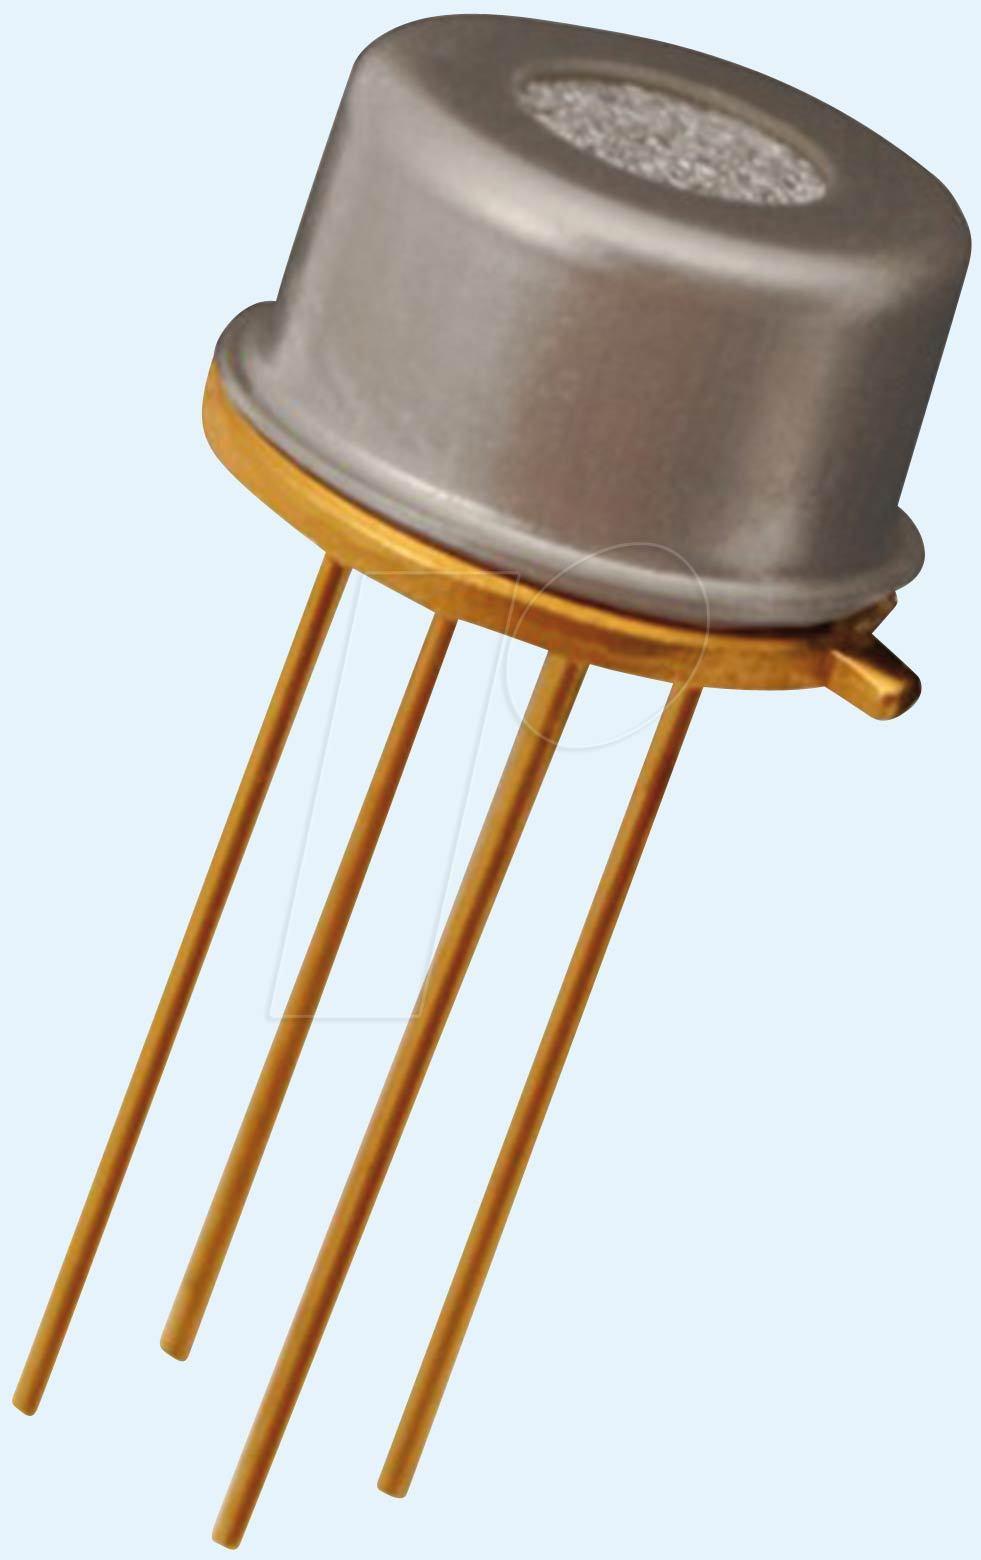 Humidity Sensor Dig  I U00b2c 0